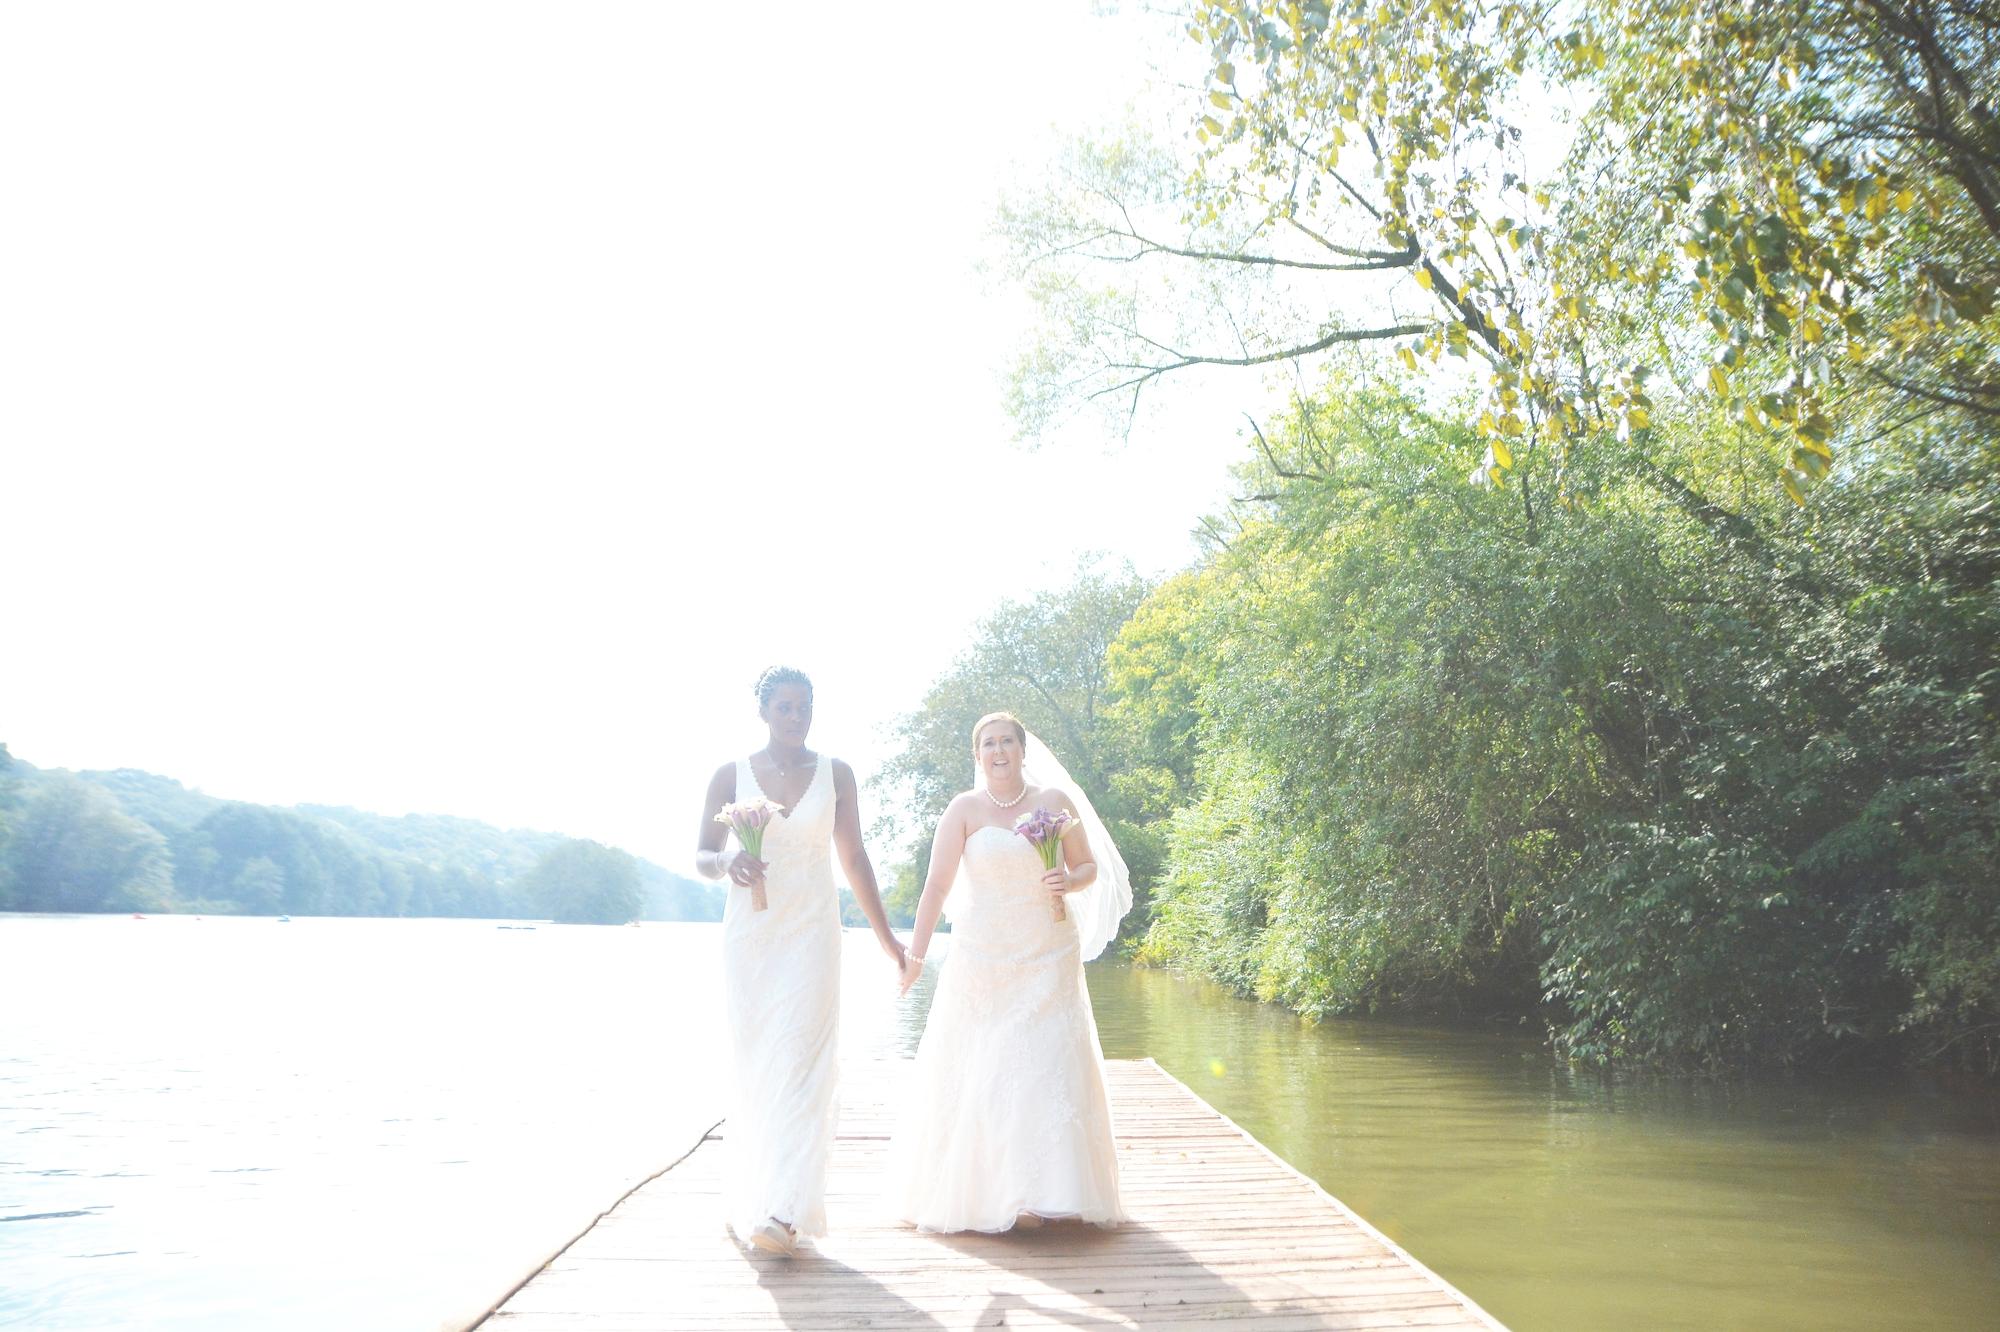 interracial-same-sex-wedding-six-hearts-photography-21